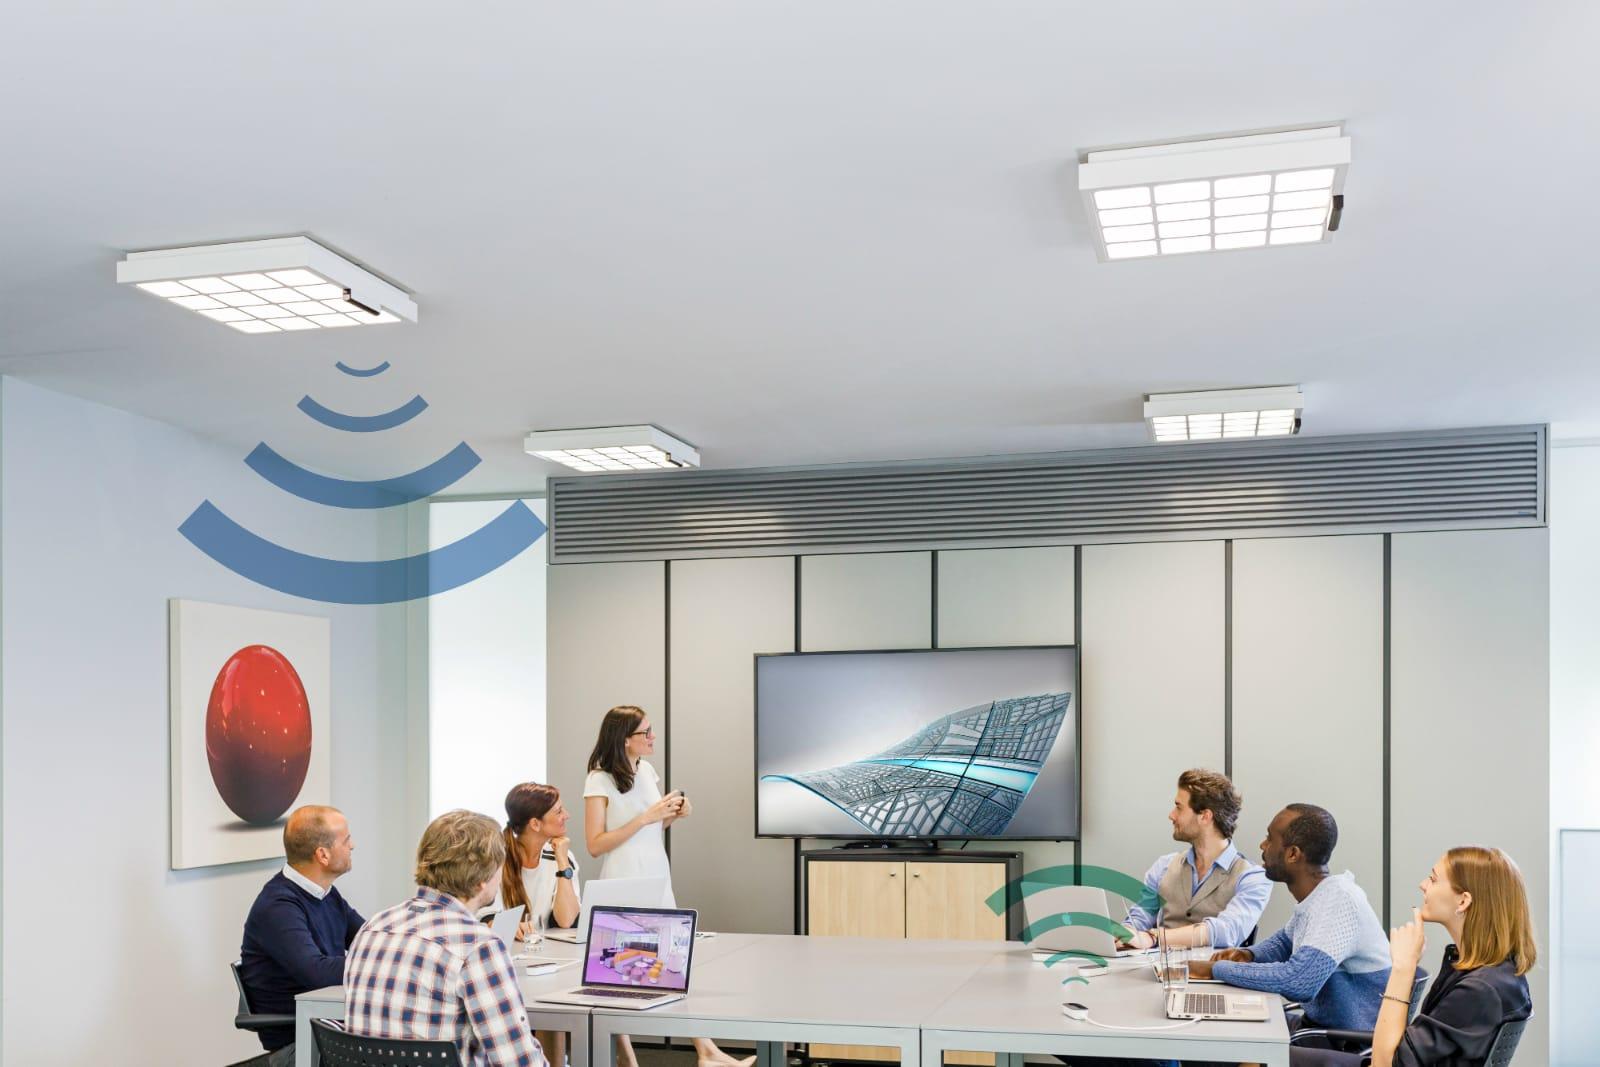 Signify's LiFi system promises up to 150 Mbps internet via LED lights